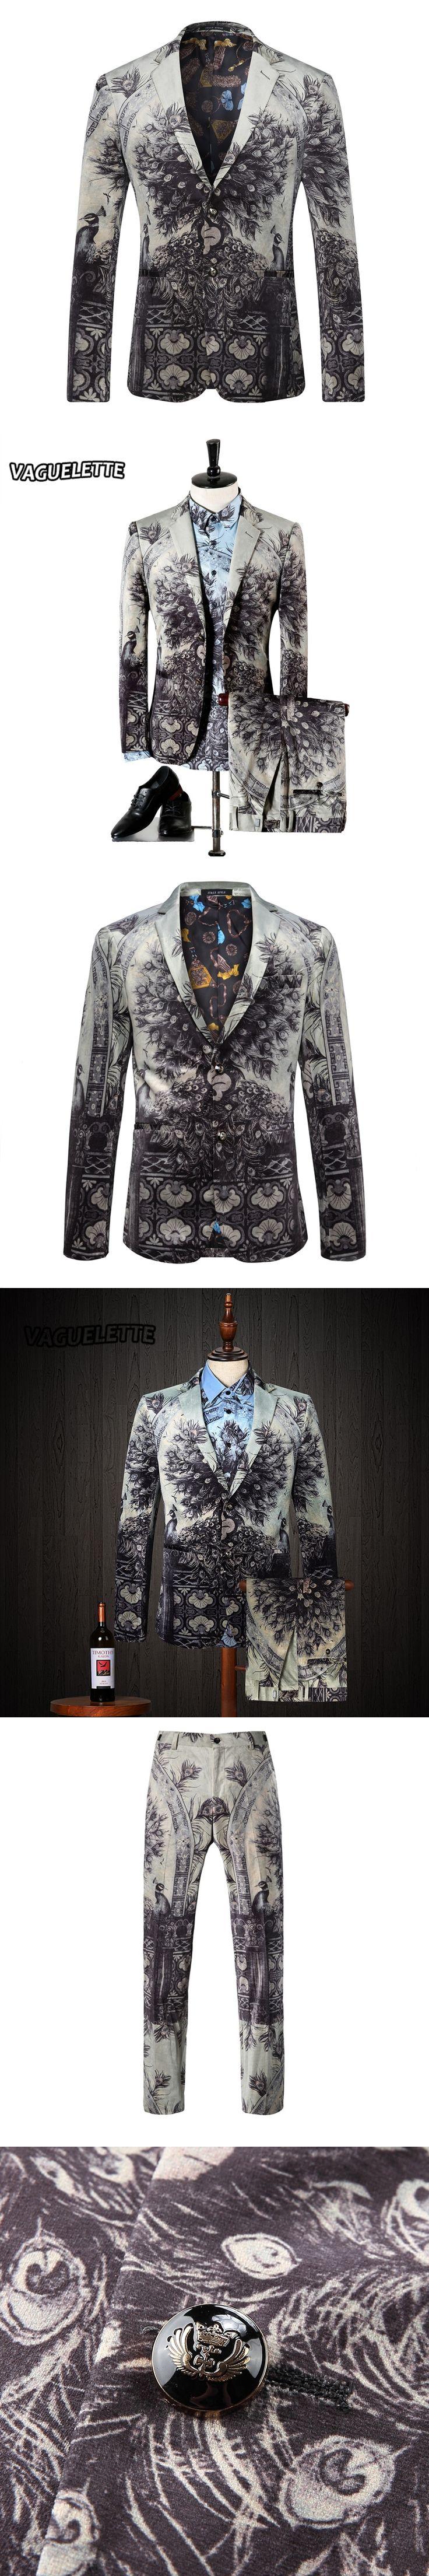 Light Grey Slim Fit Suits For Men Peacock Parrot Pattern Stage Wear Vintage Wedding Mens Skinny Suit M-3XL (Blazer+Pants+Shirts)